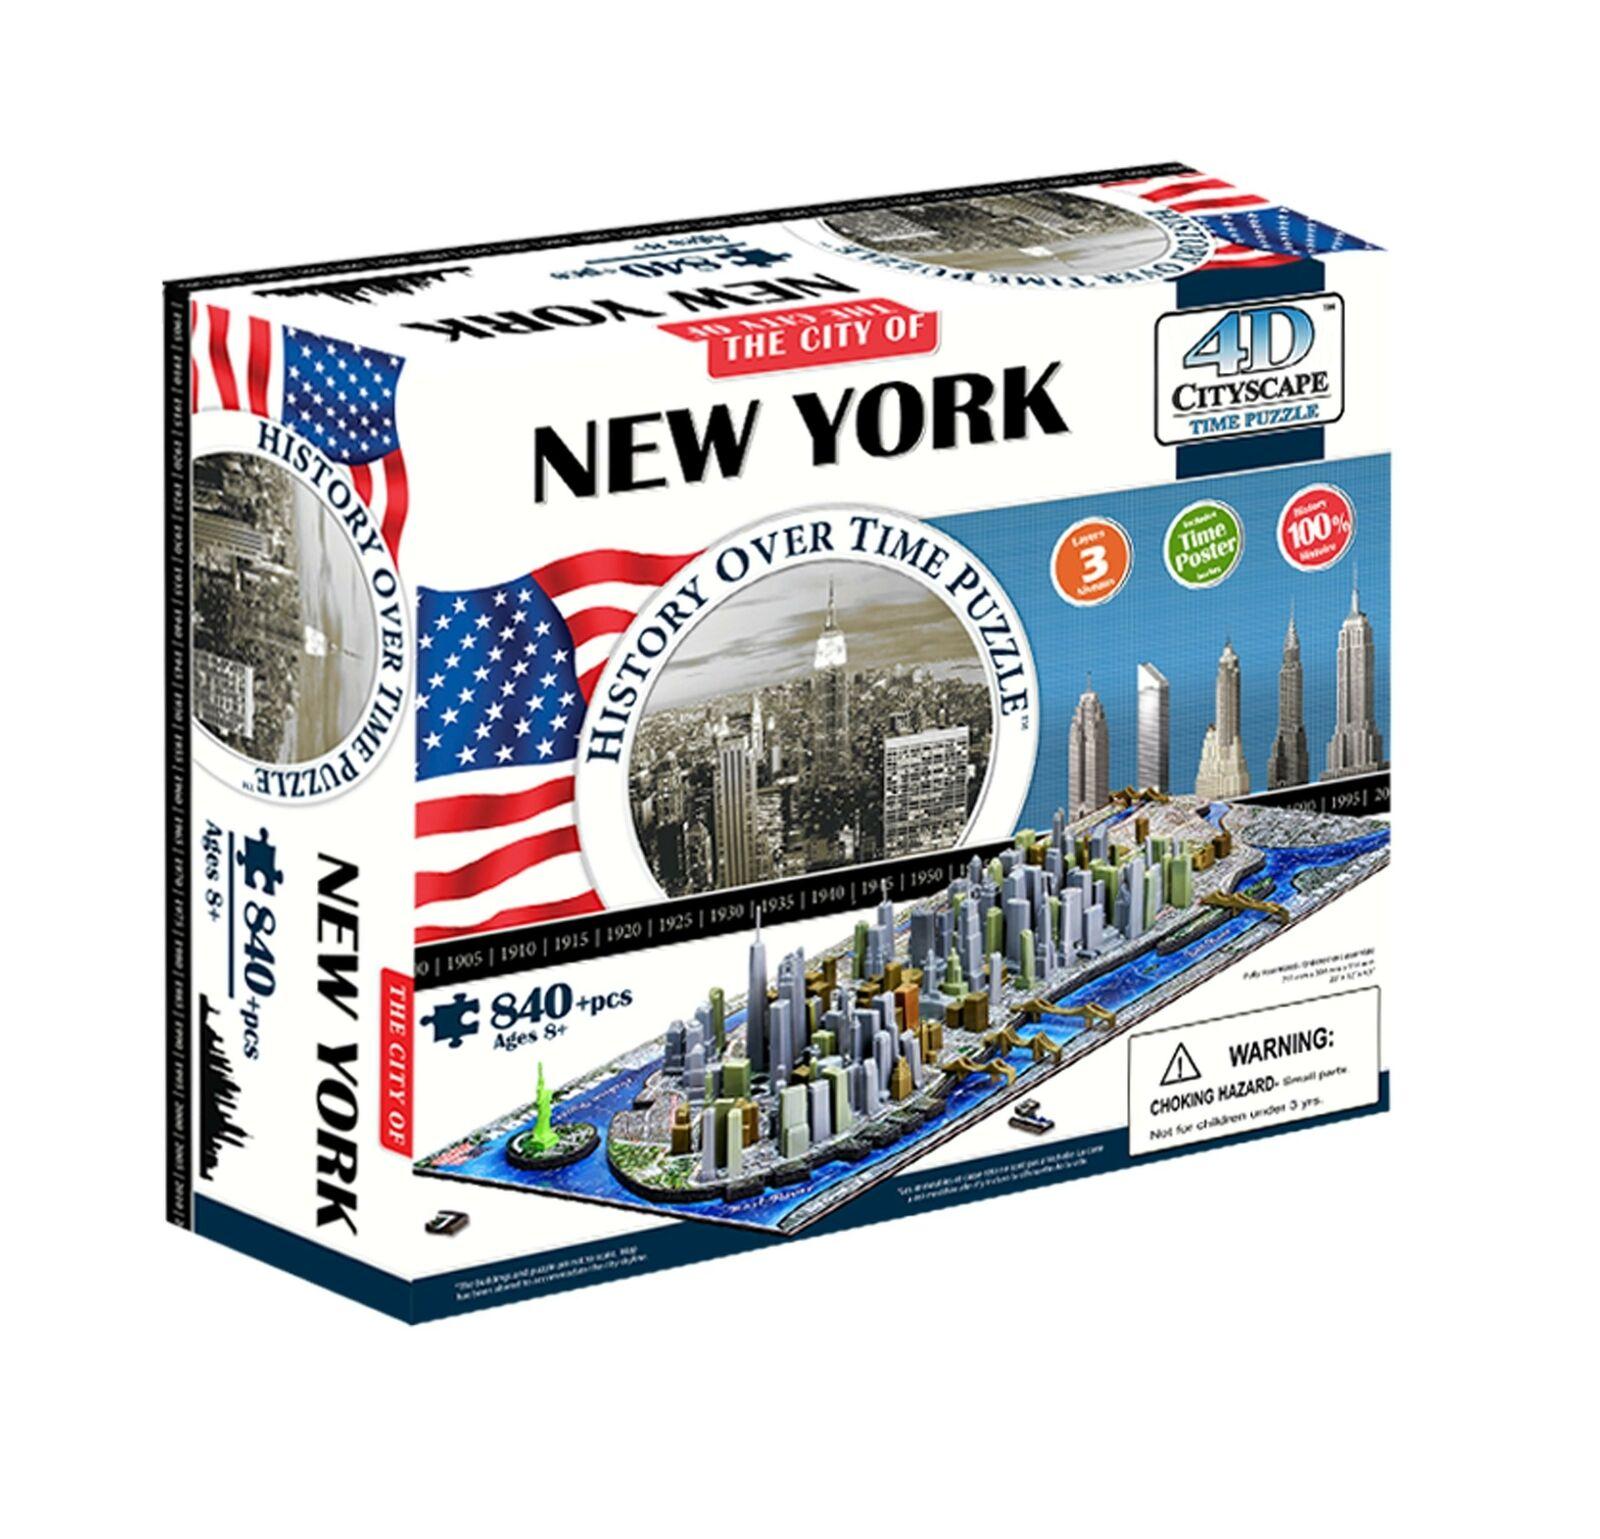 4D cittàscape 40010 nuovo YORK  USA Puzzle, MultiColoreeee  negozio online outlet